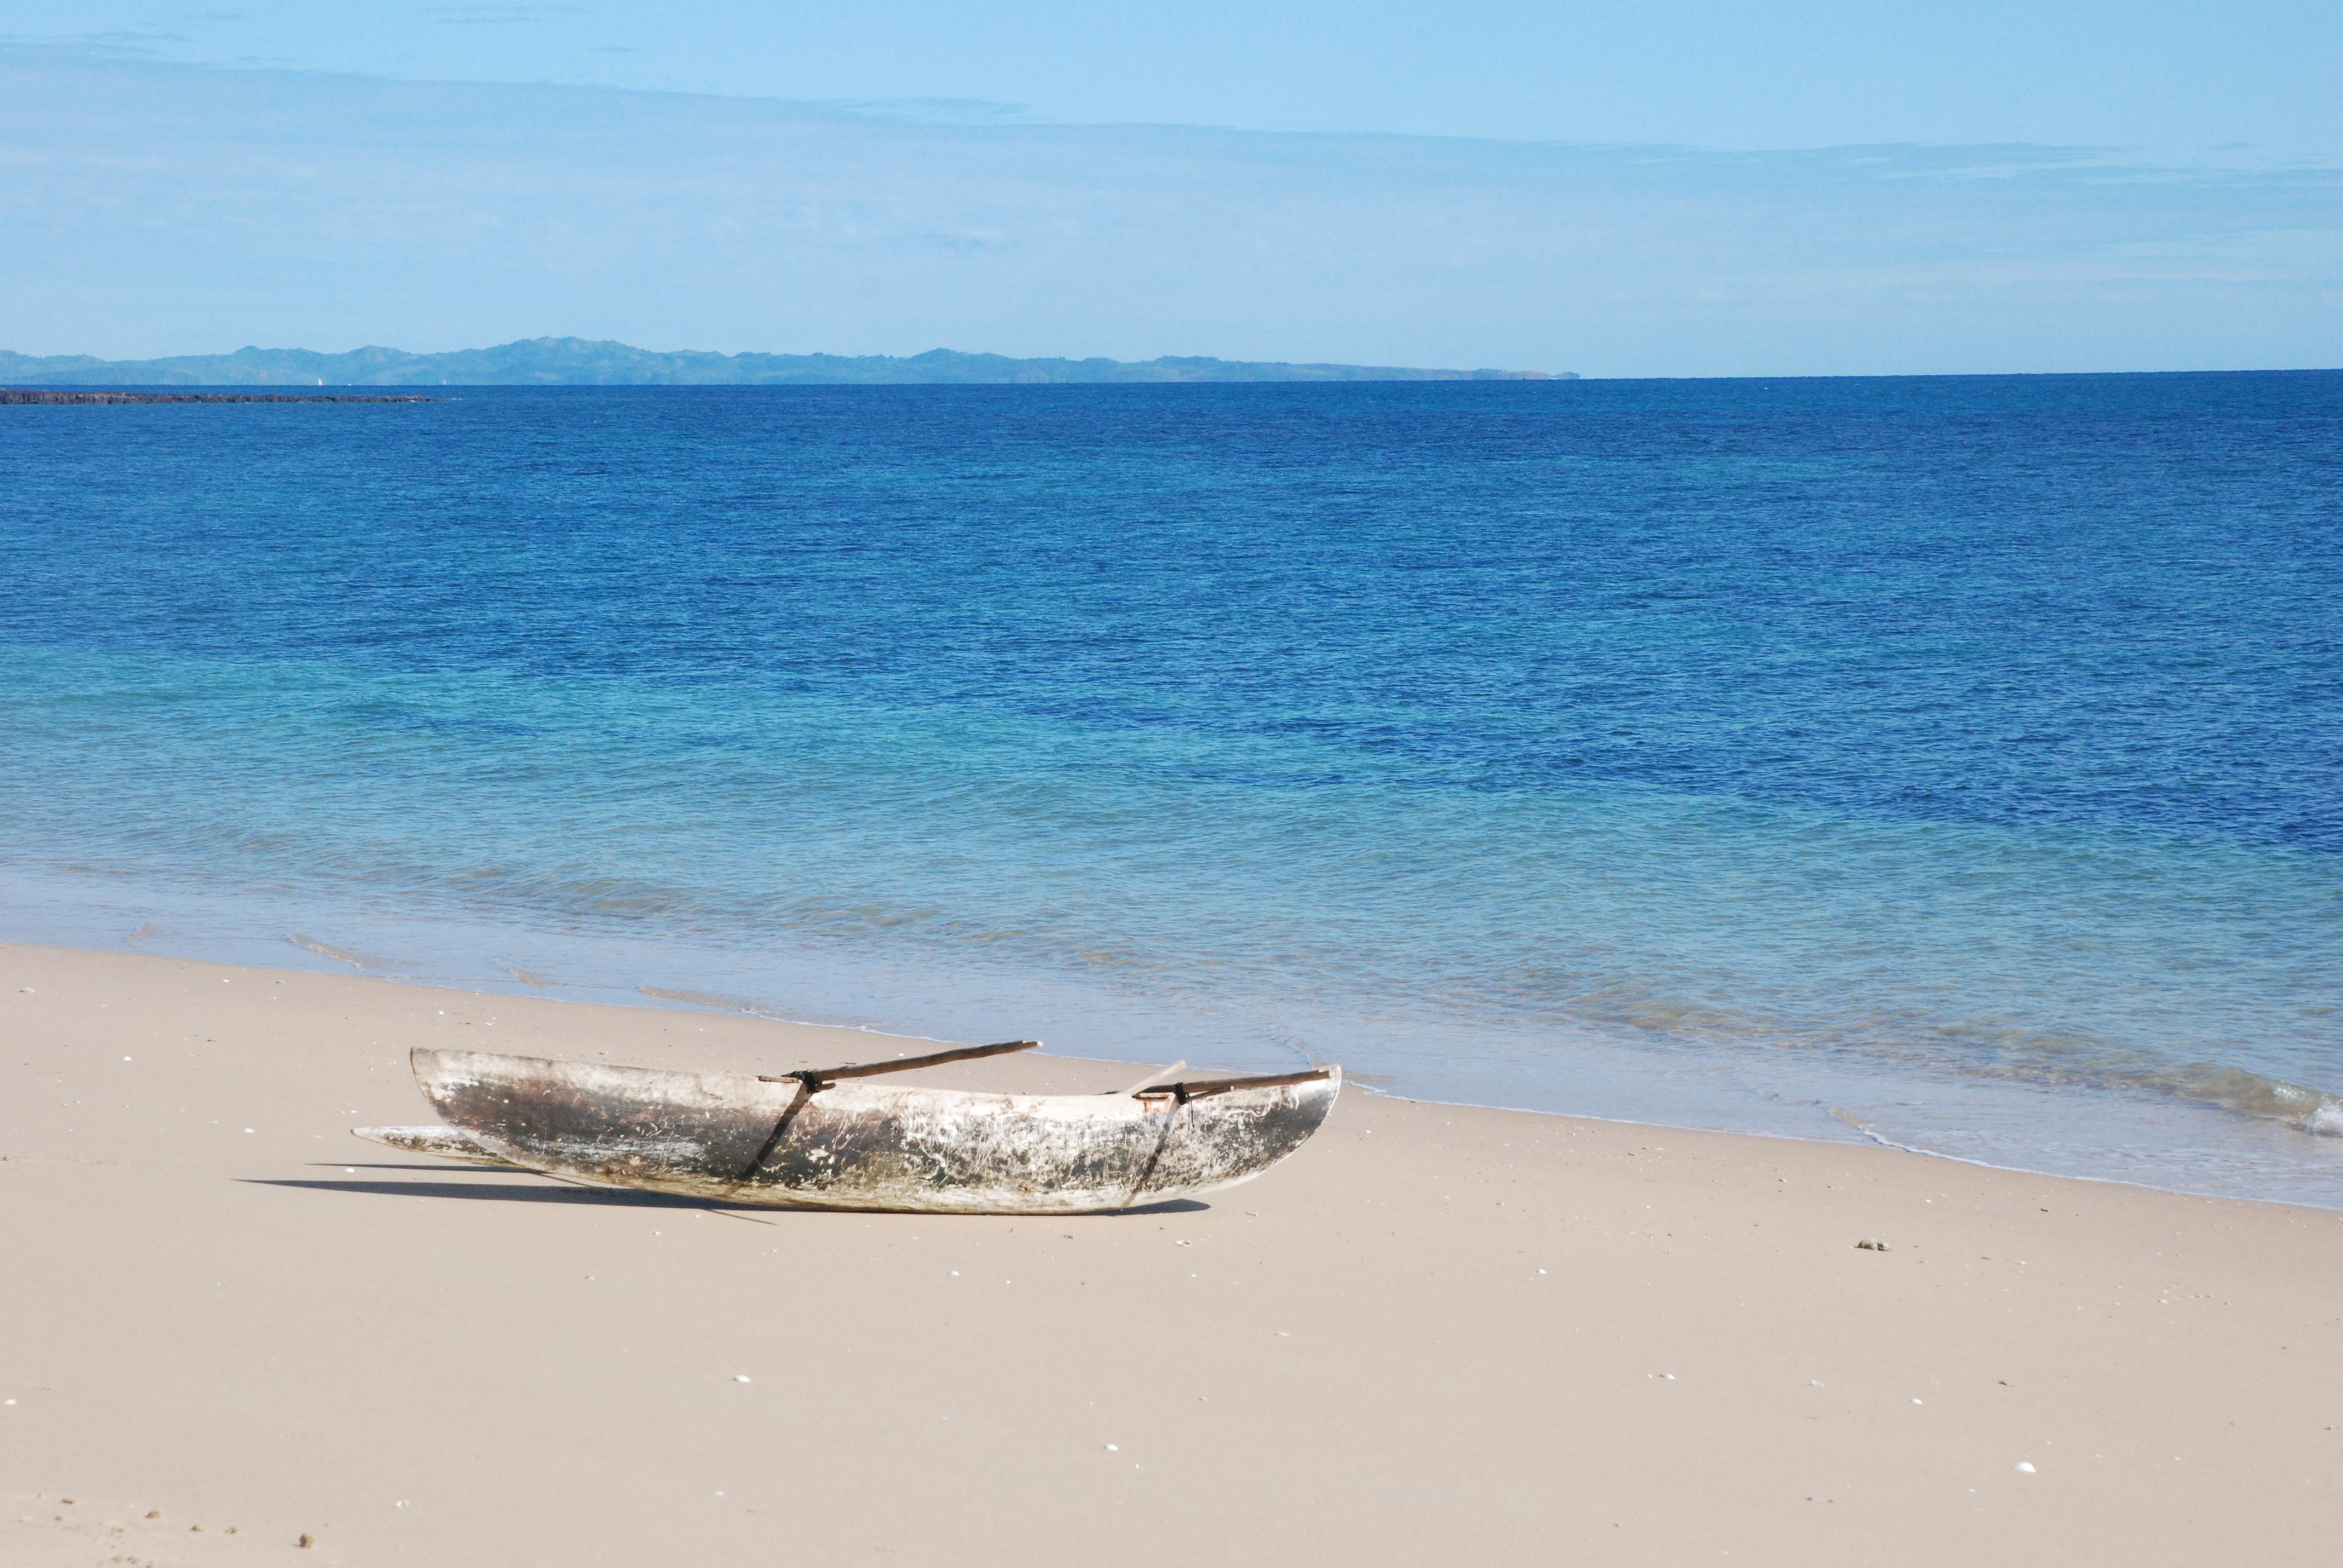 barque pecheur 2